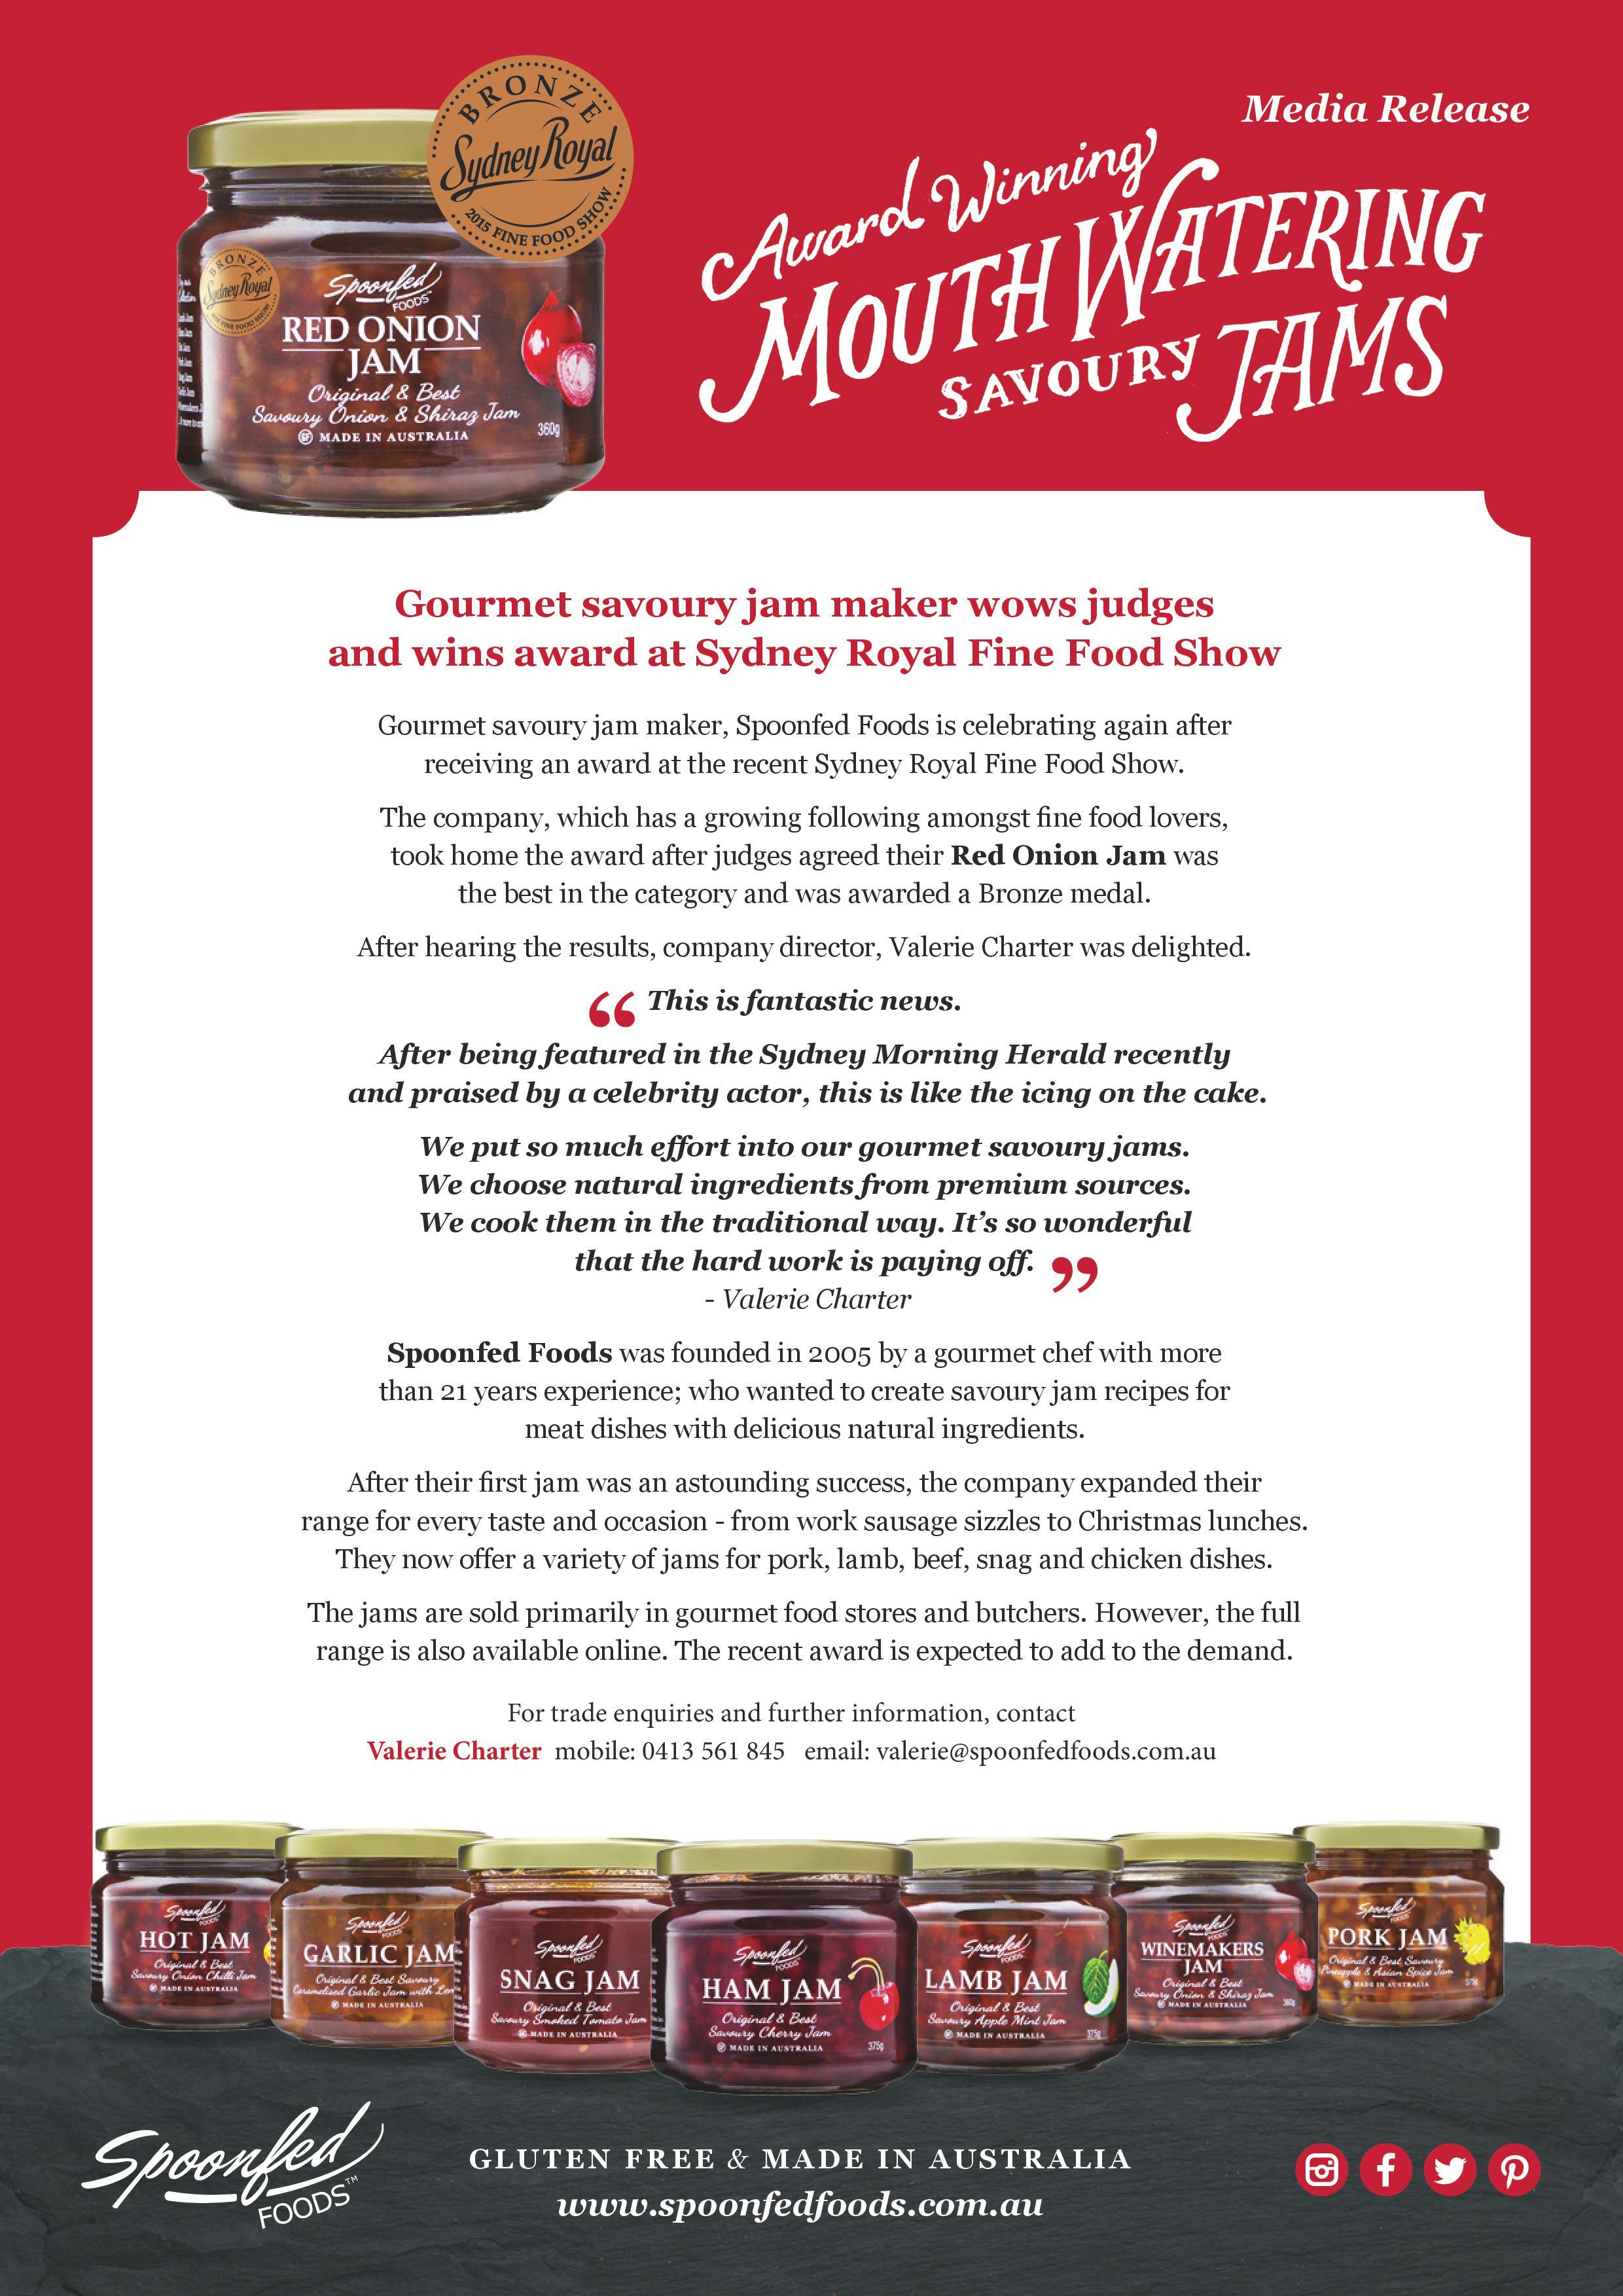 Award winning mouthwatering savoury jams